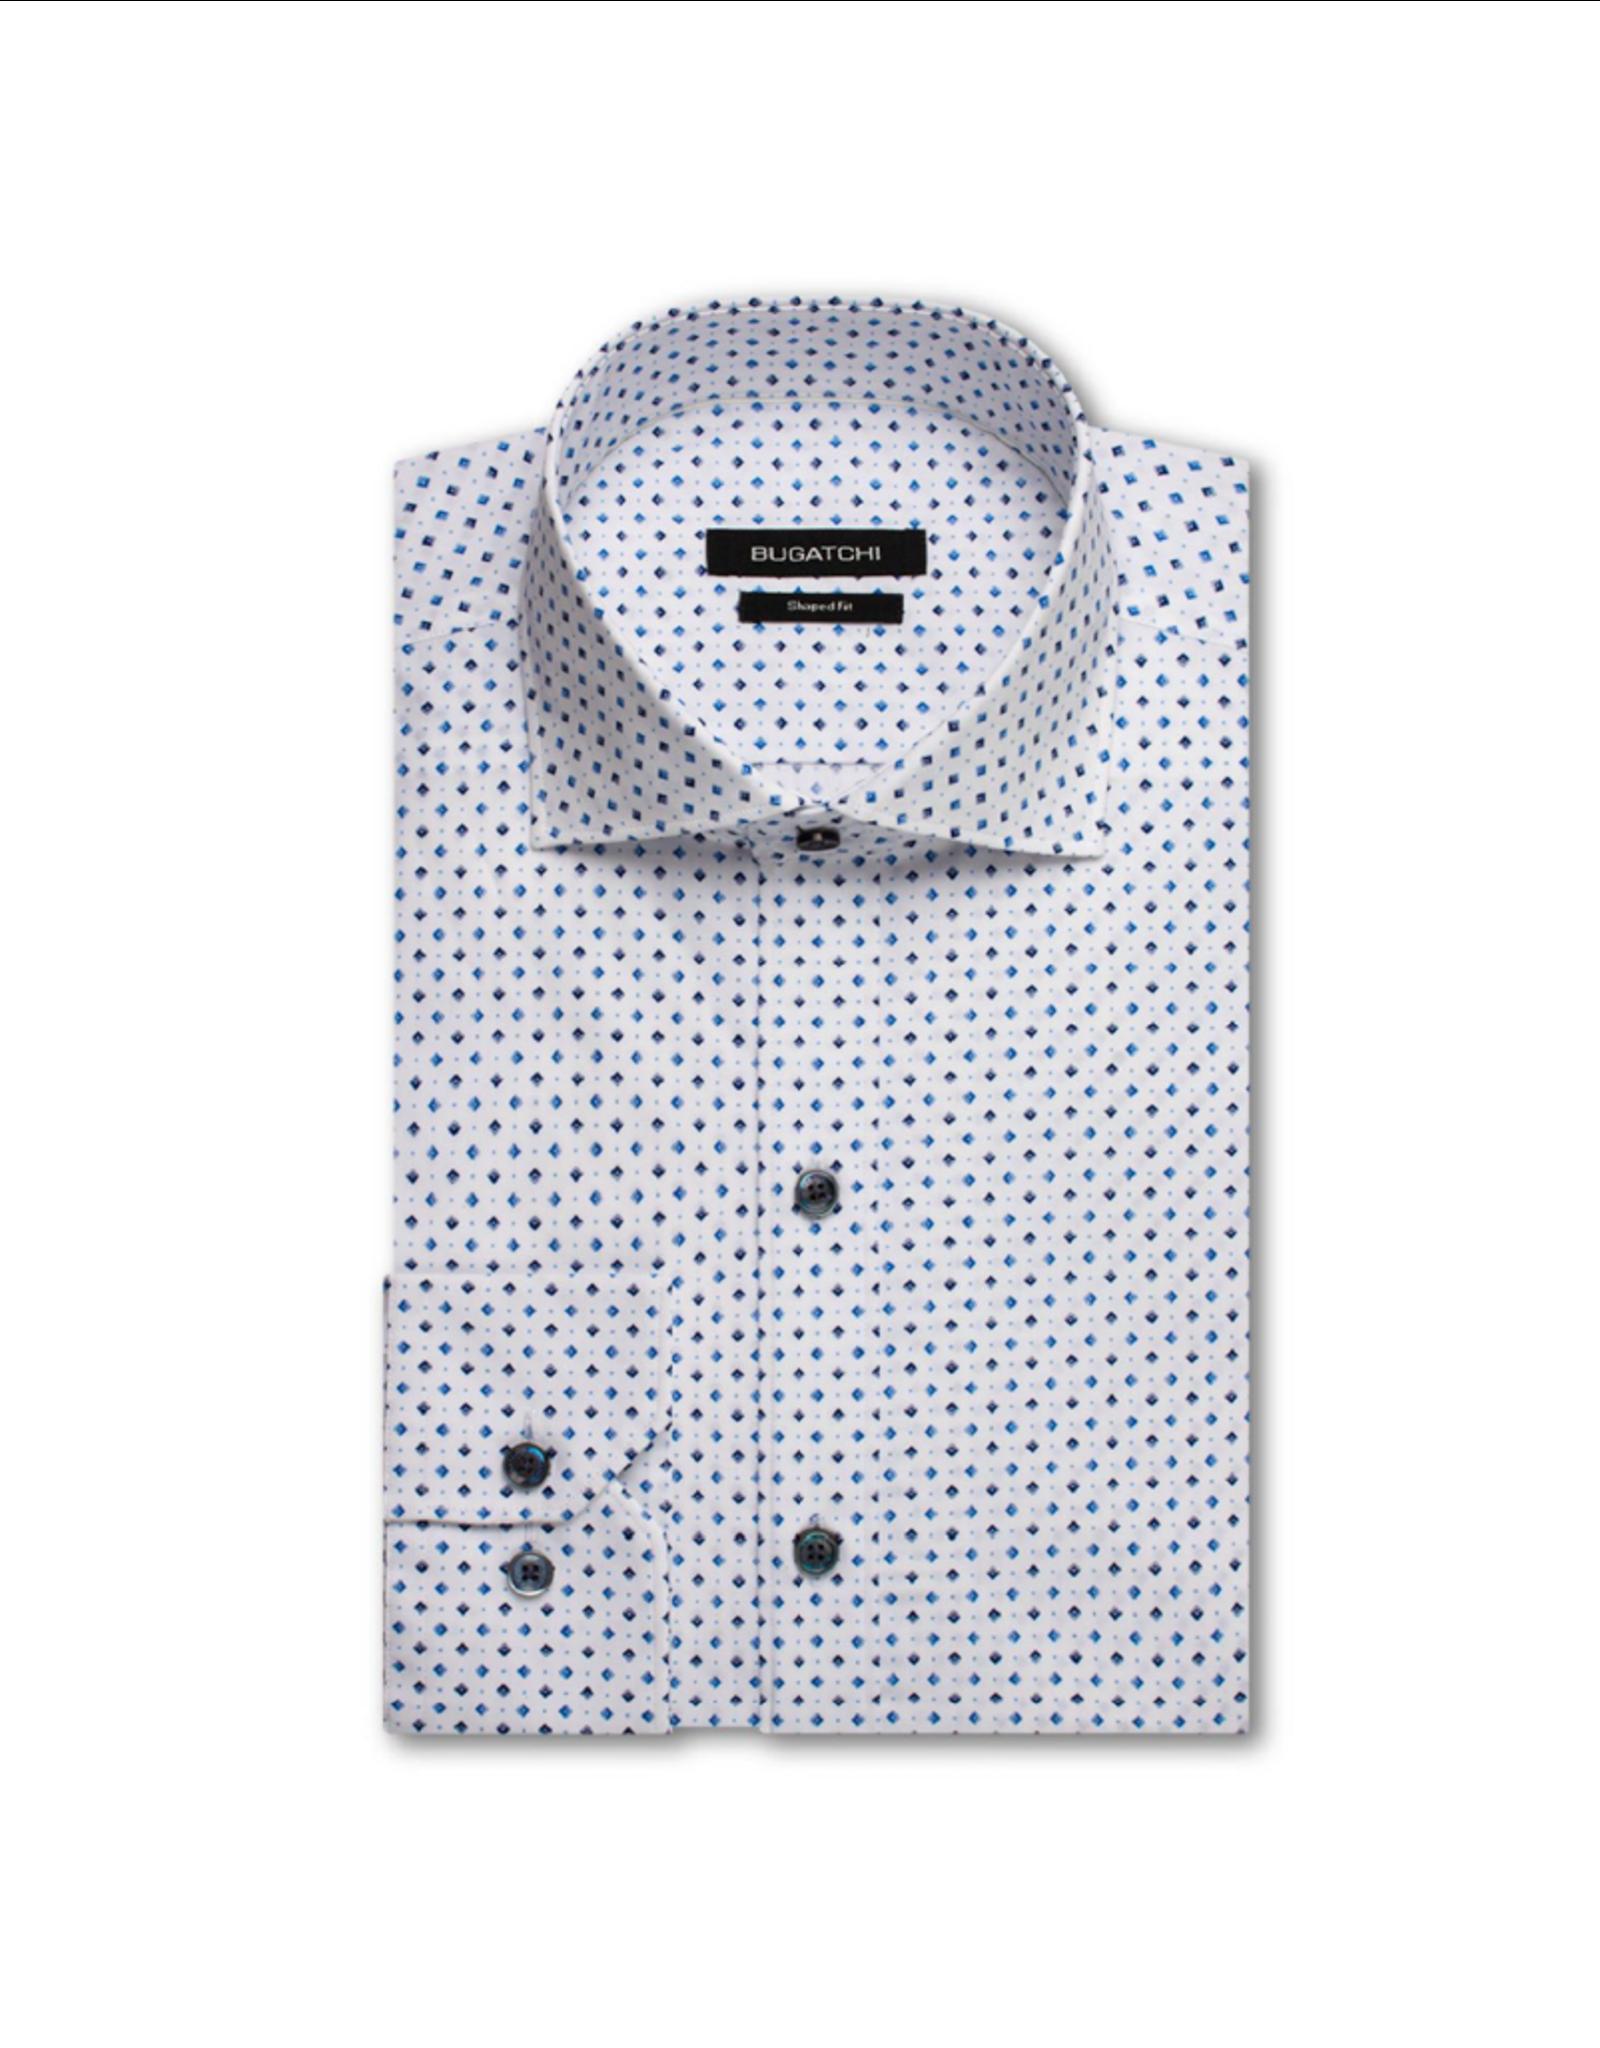 Bugatchi Uomo Diamond L/S Button Up